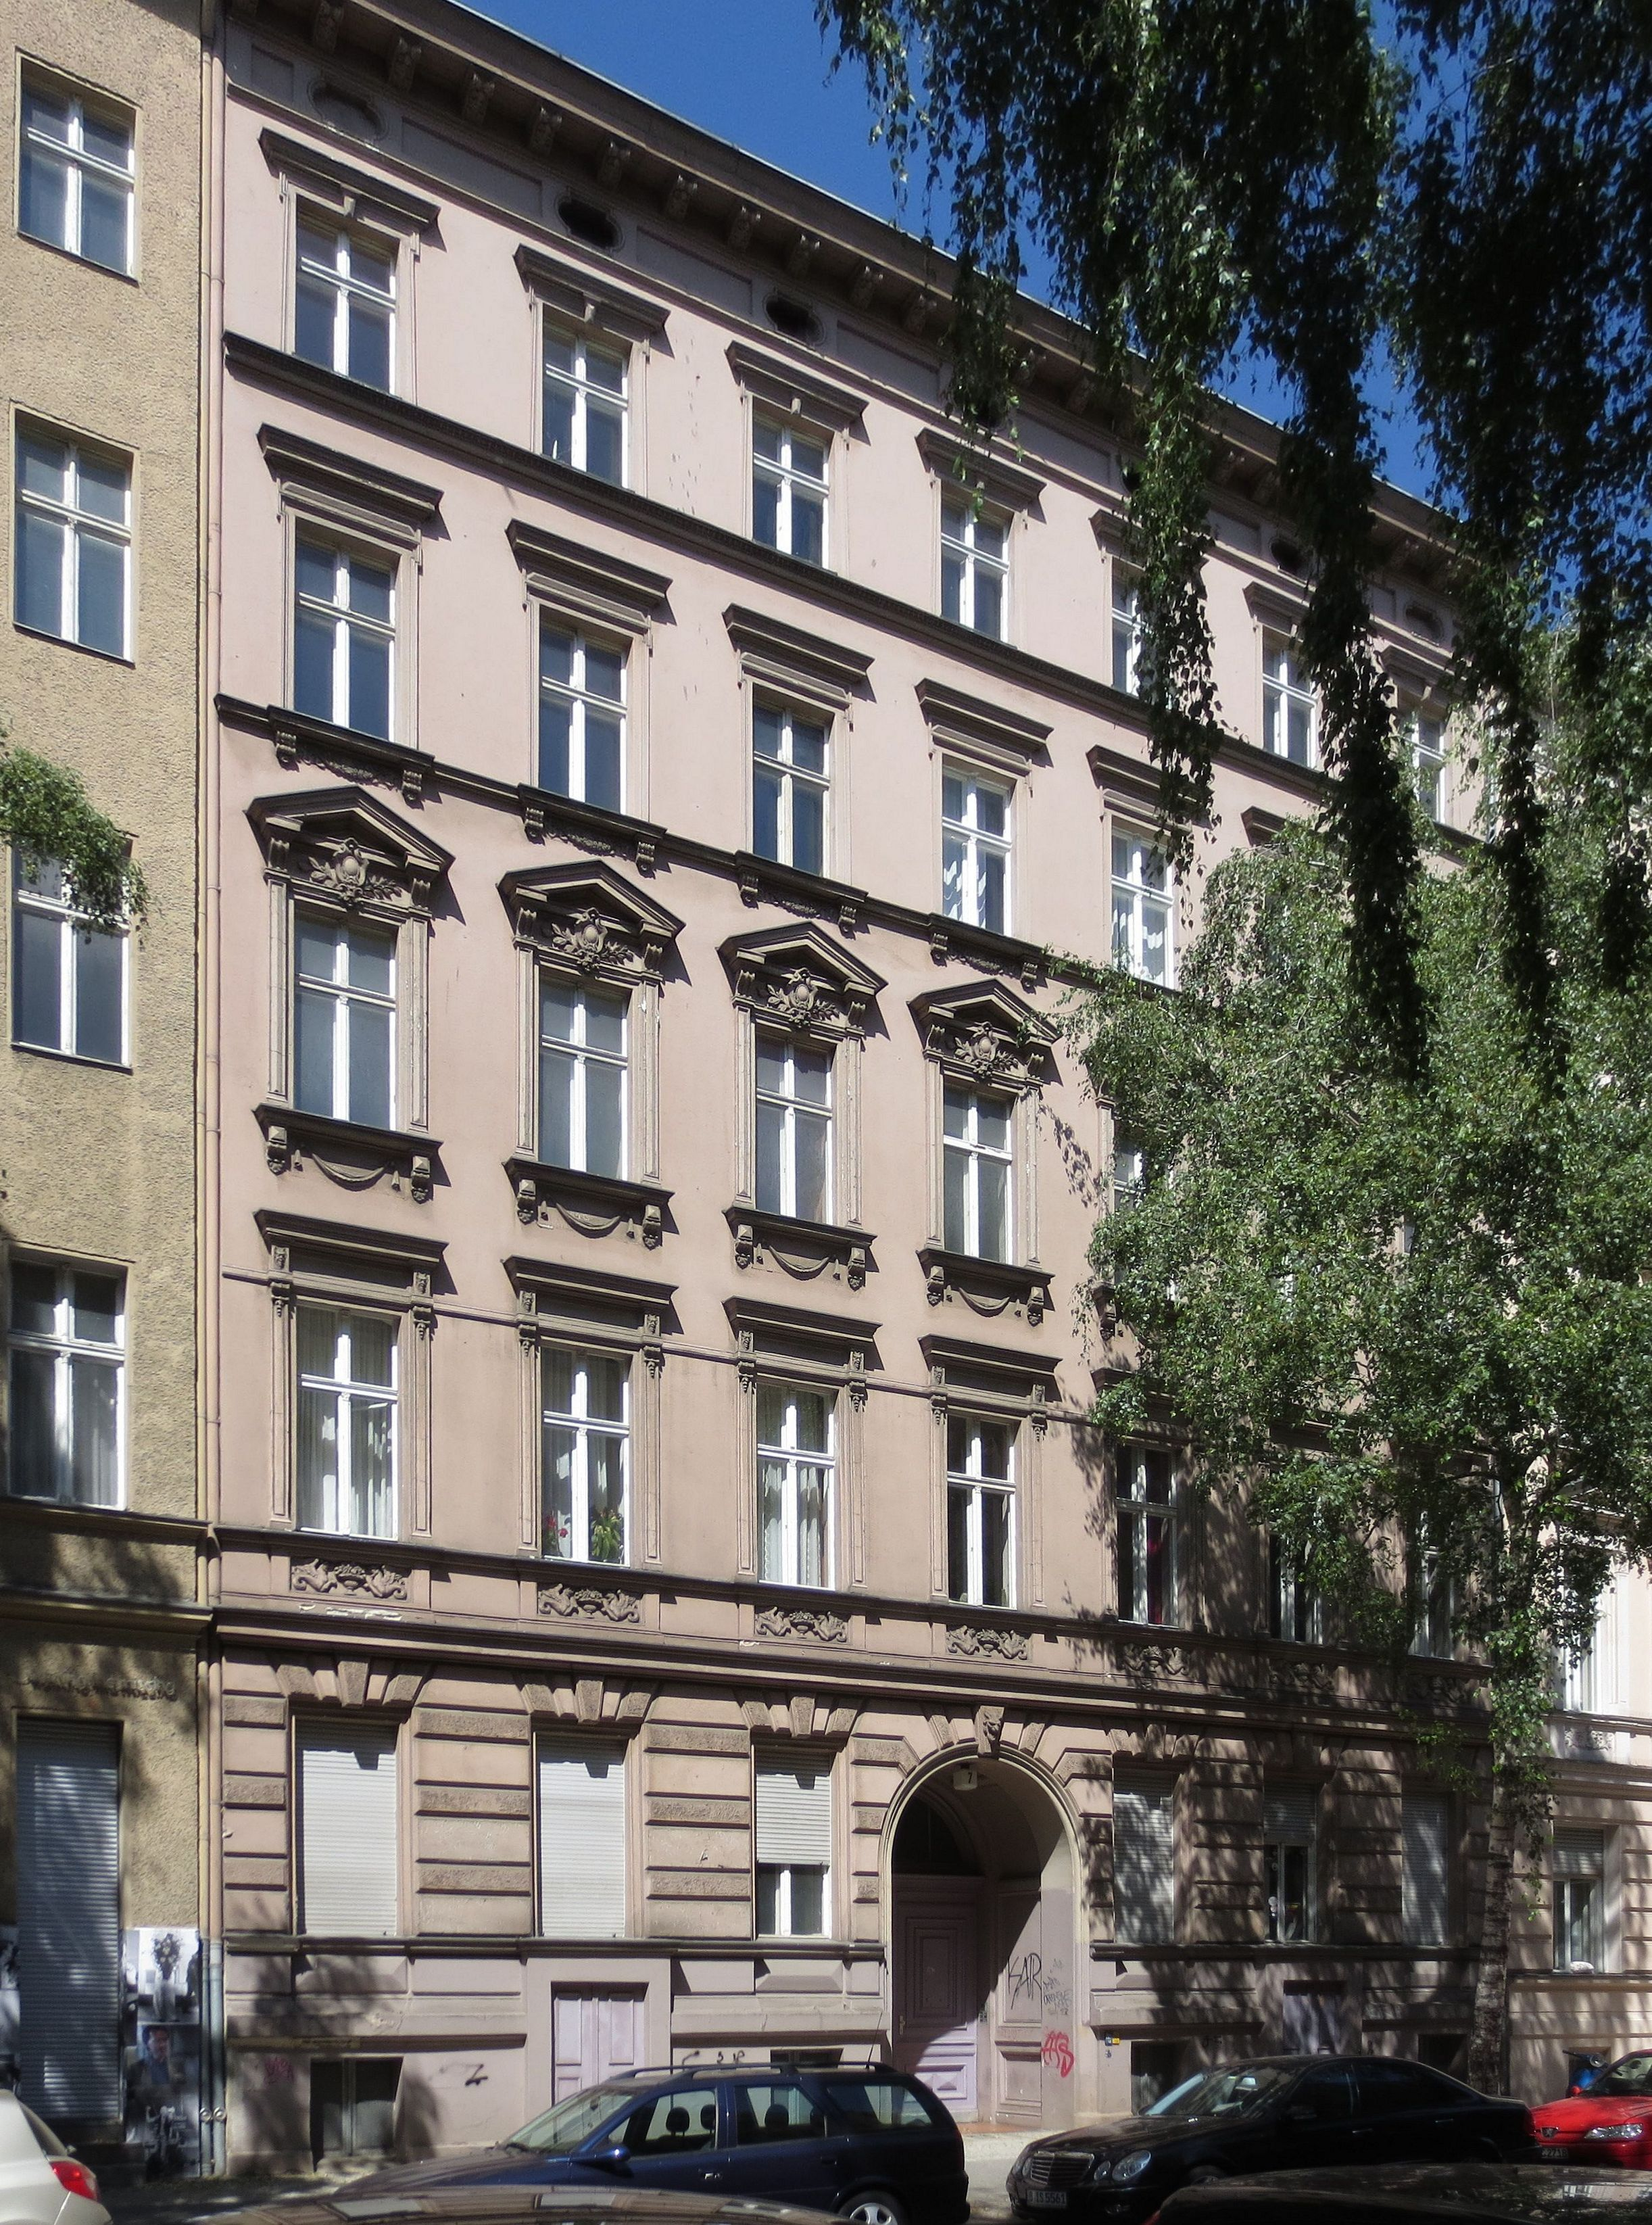 file berlin schoeneberg blumenthalstrasse 7 wikimedia commons. Black Bedroom Furniture Sets. Home Design Ideas